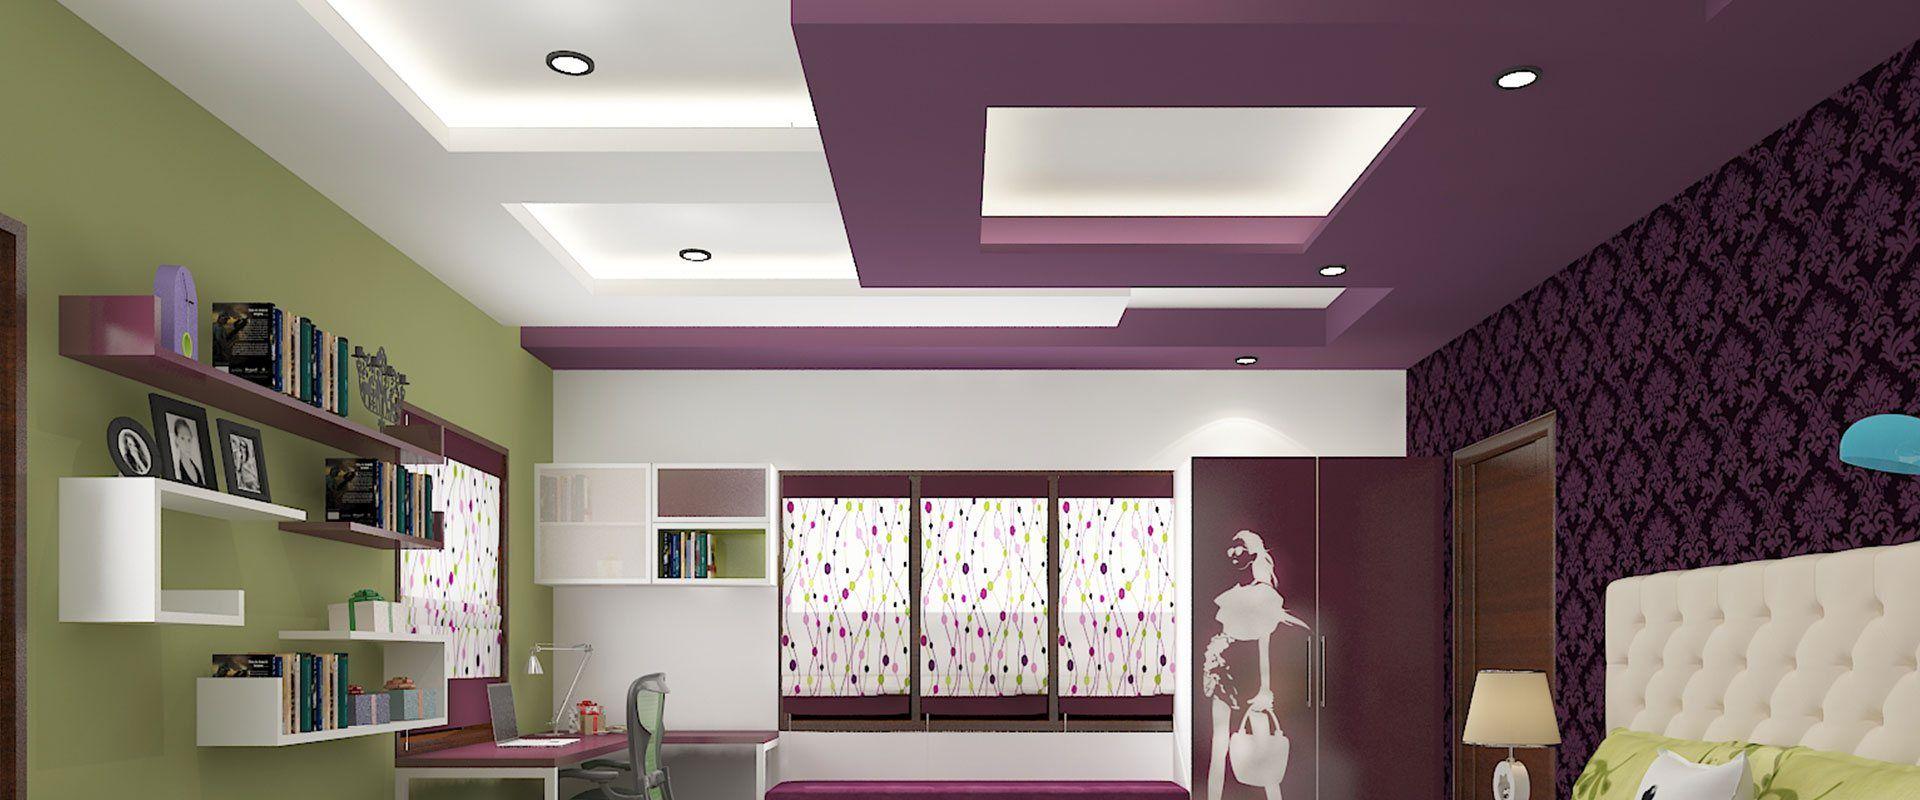 False ceiling gypsum board drywall plaster saint gobain false ceiling gypsum board drywall plaster saint gobain gyproc india dailygadgetfo Images